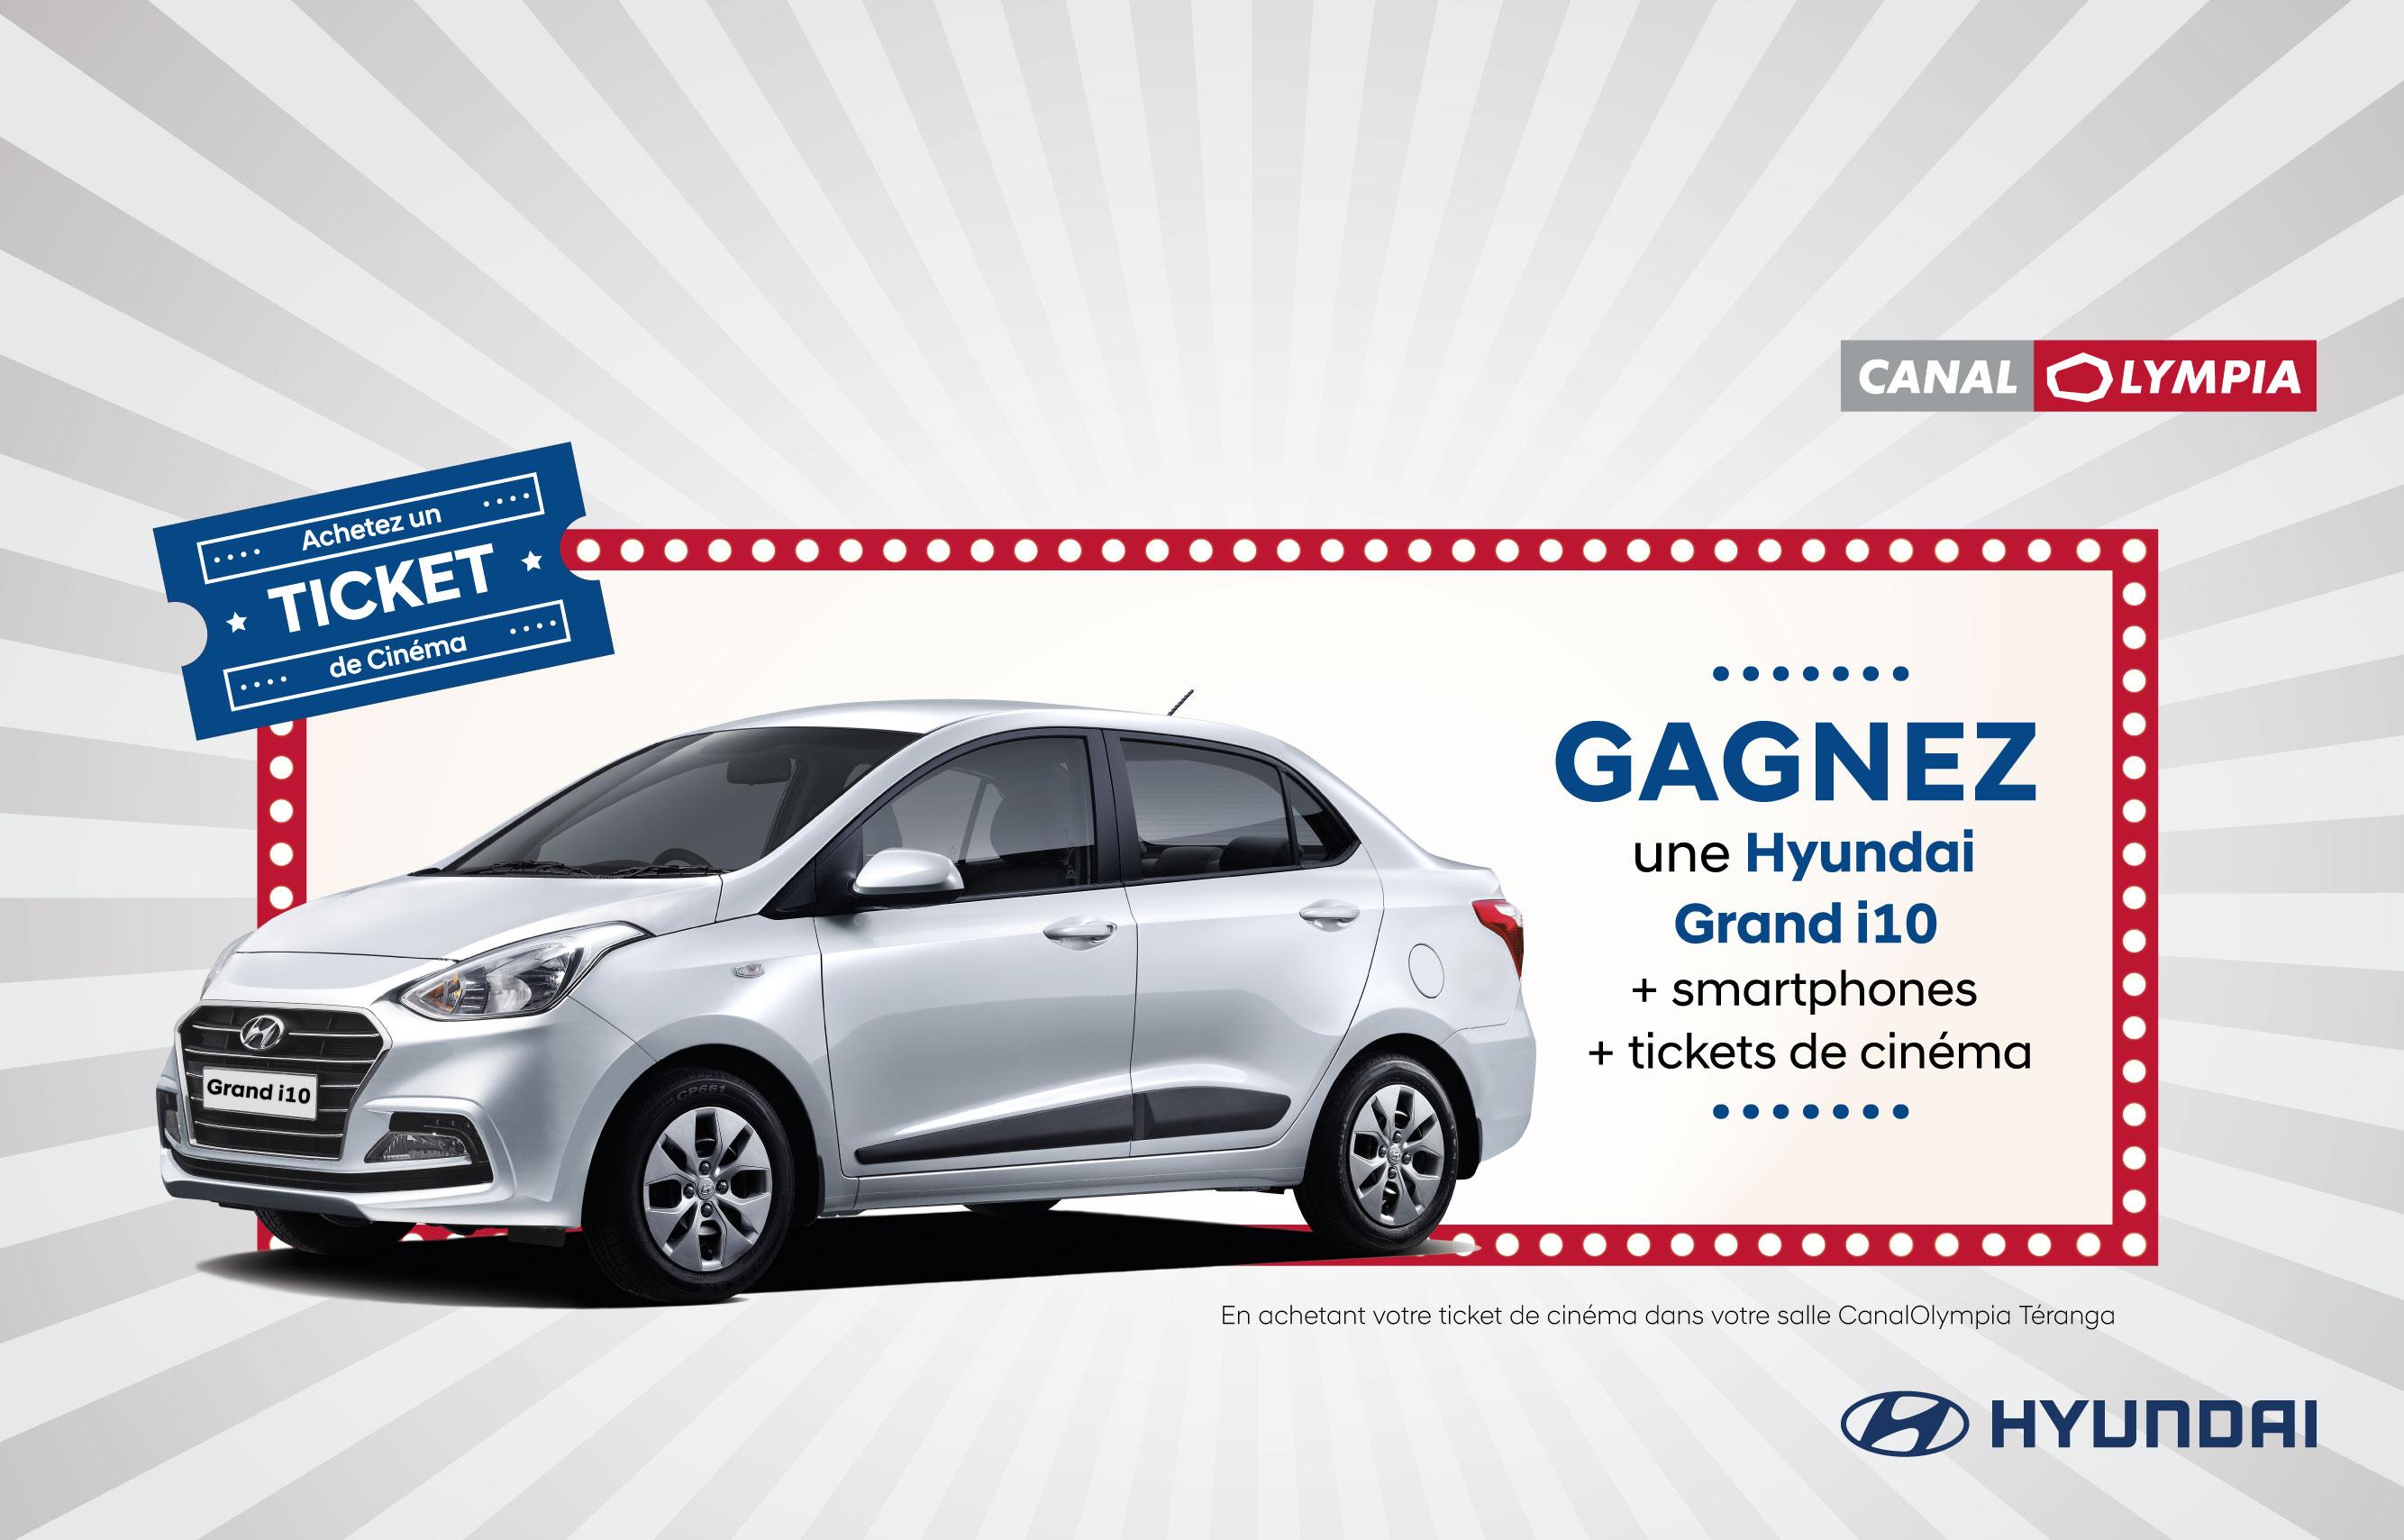 Gagnez une Hyundai Grand i10 avec Canal Olympia